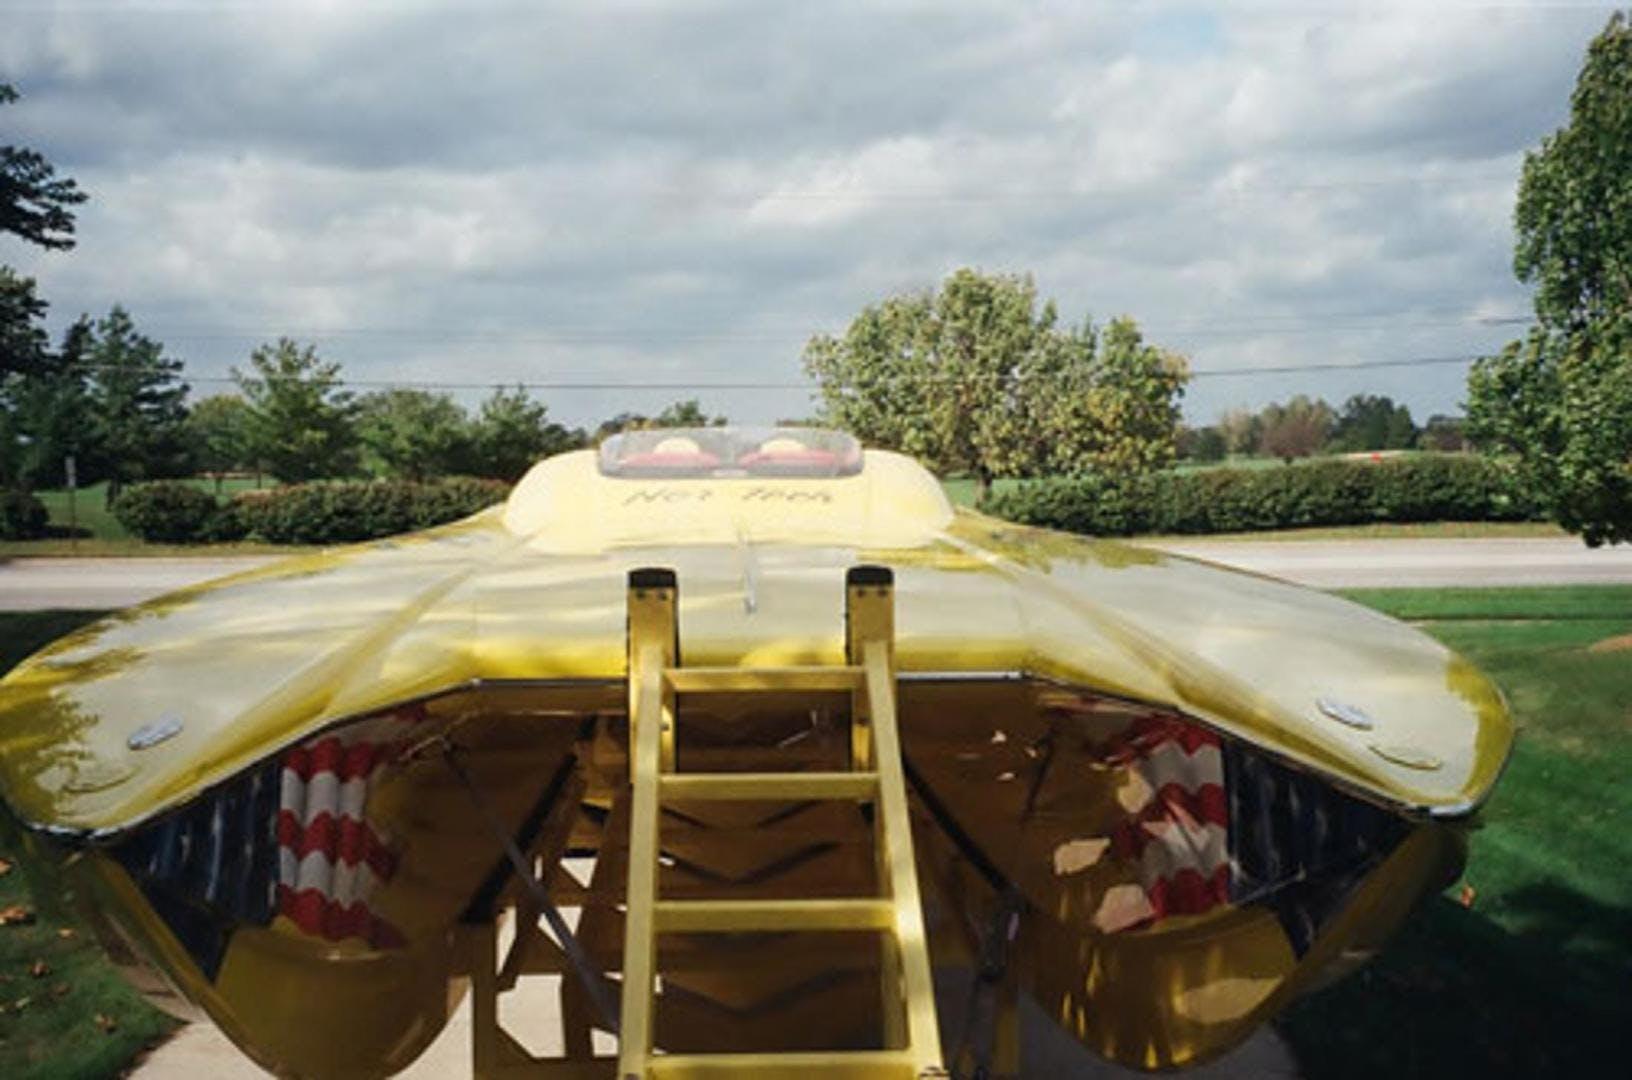 2002 Nor-Tech 50' 5000 Supercat PREDATOR IV | Picture 5 of 10